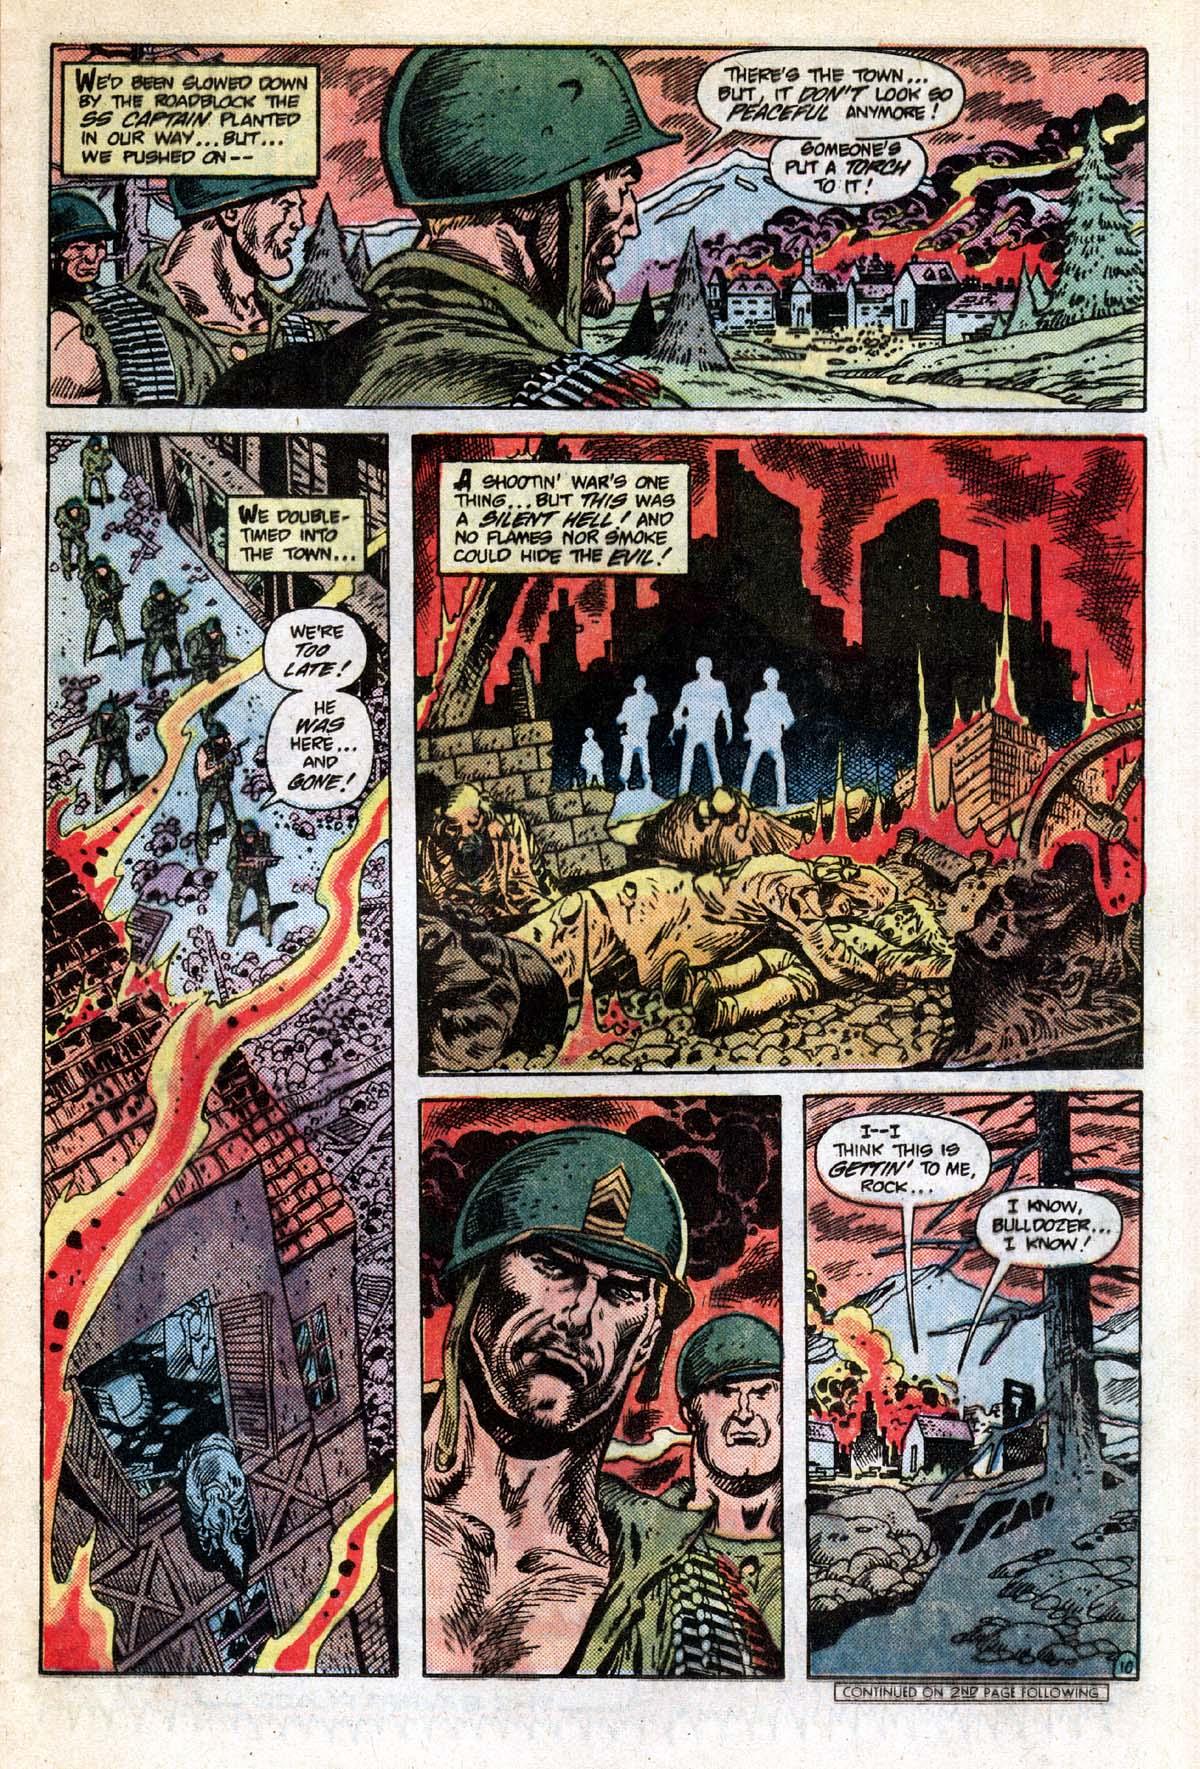 Read online Sgt. Rock comic -  Issue #391 - 11